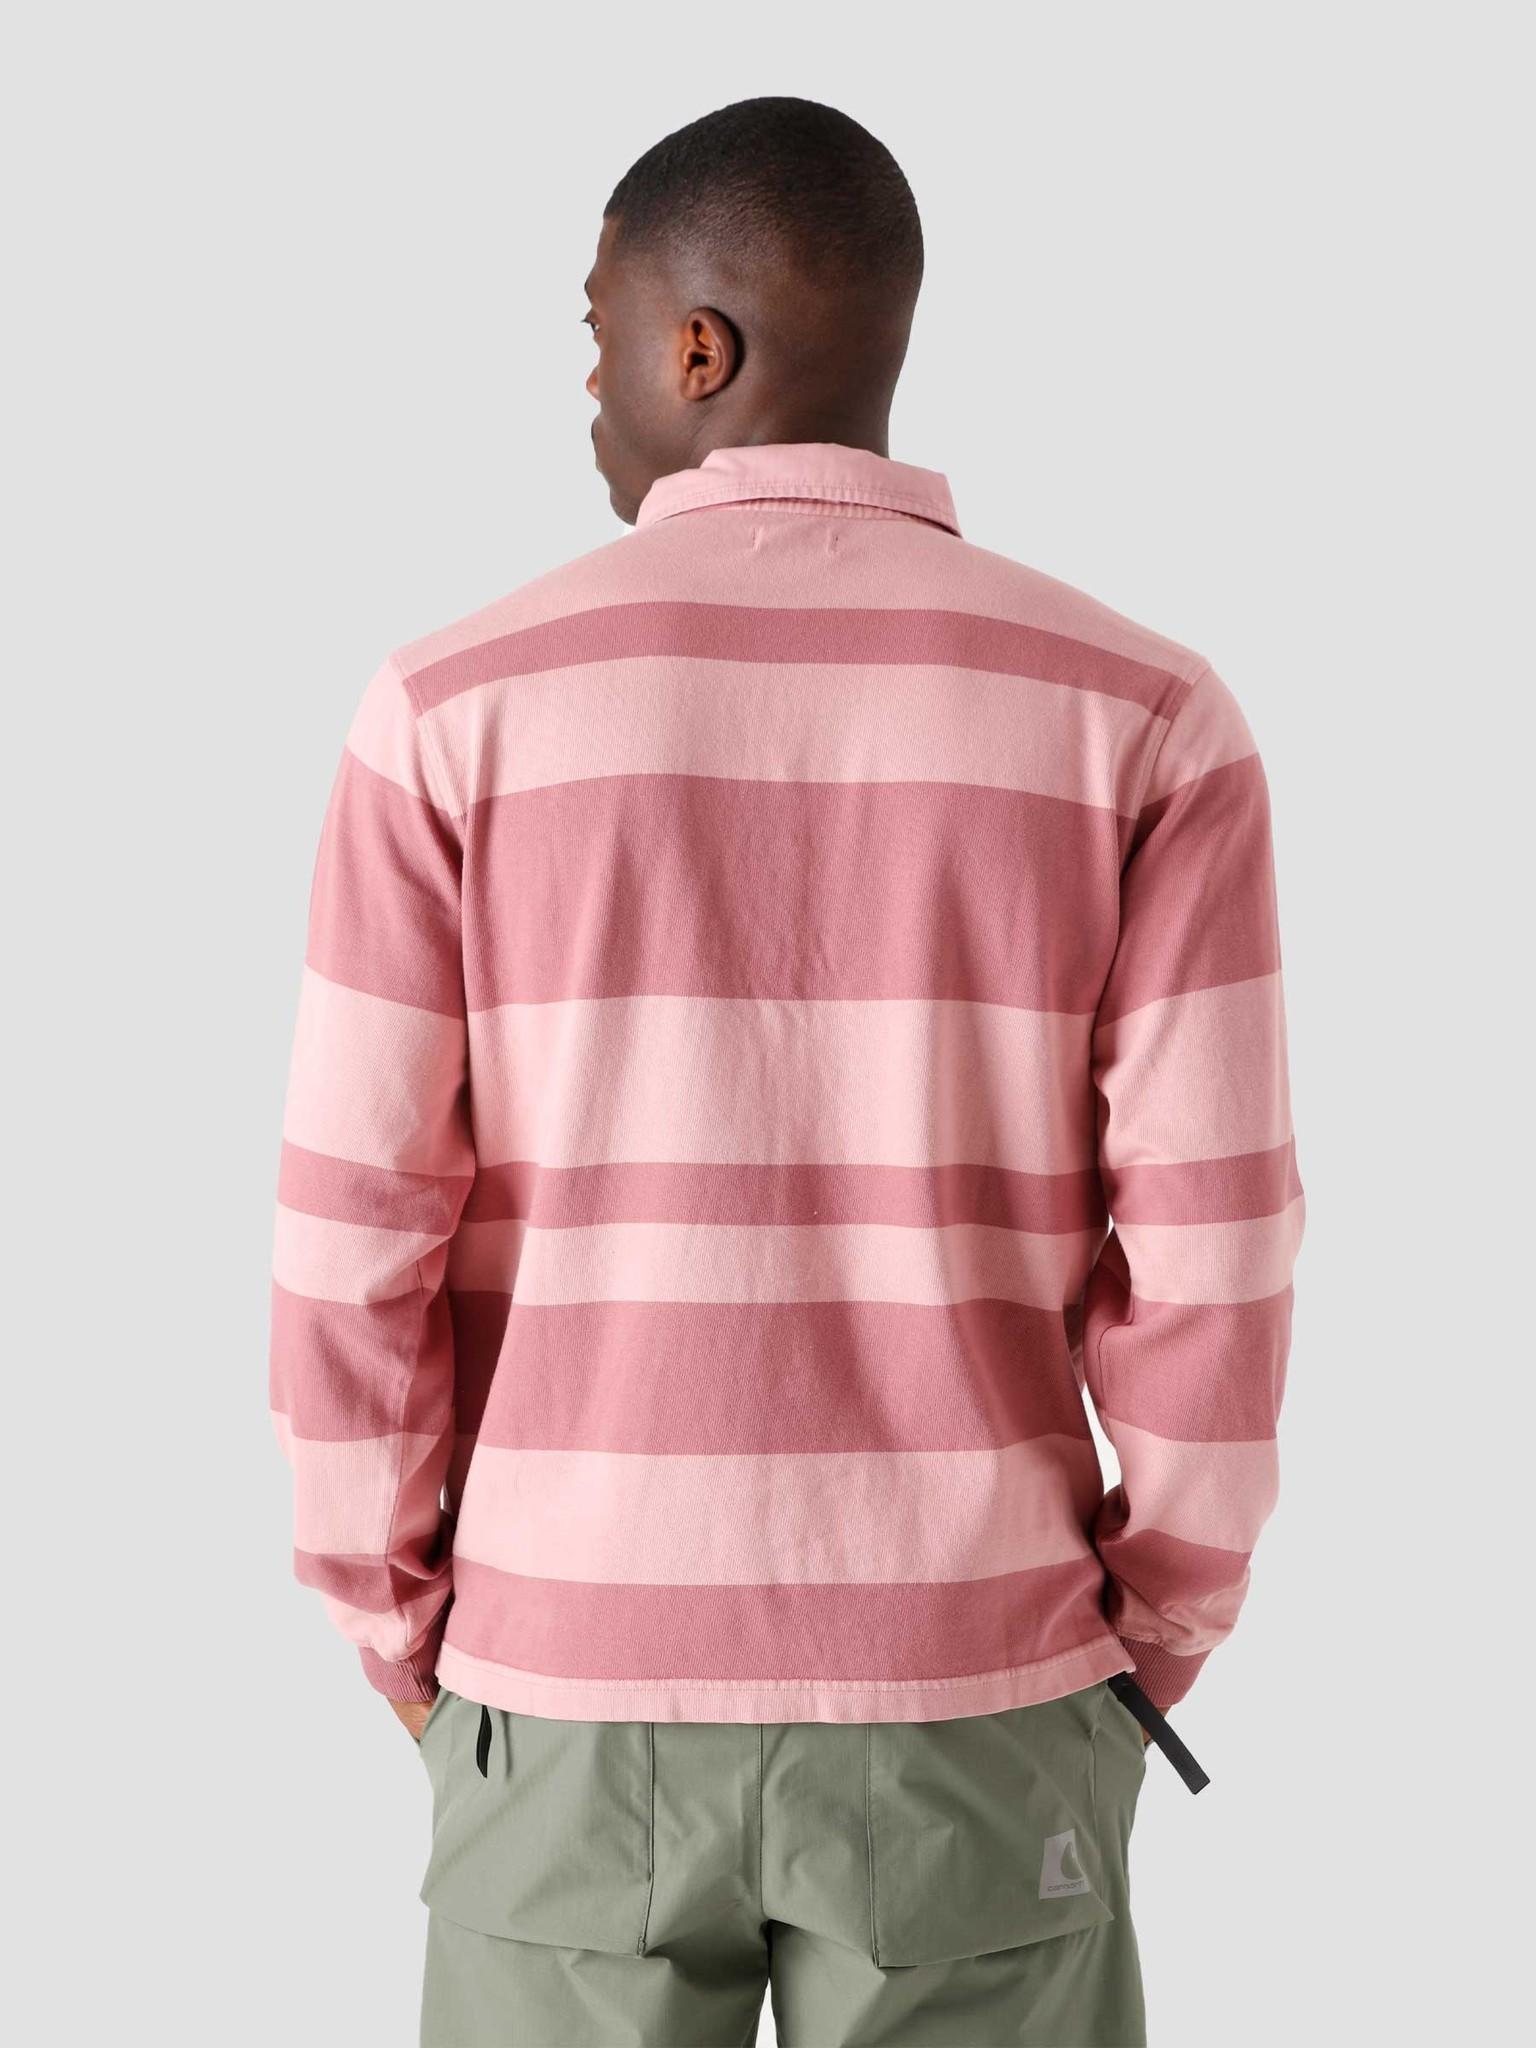 Stussy Stussy 2-Tone Stripe Longsleeve Rugby Pink 1140243-0604